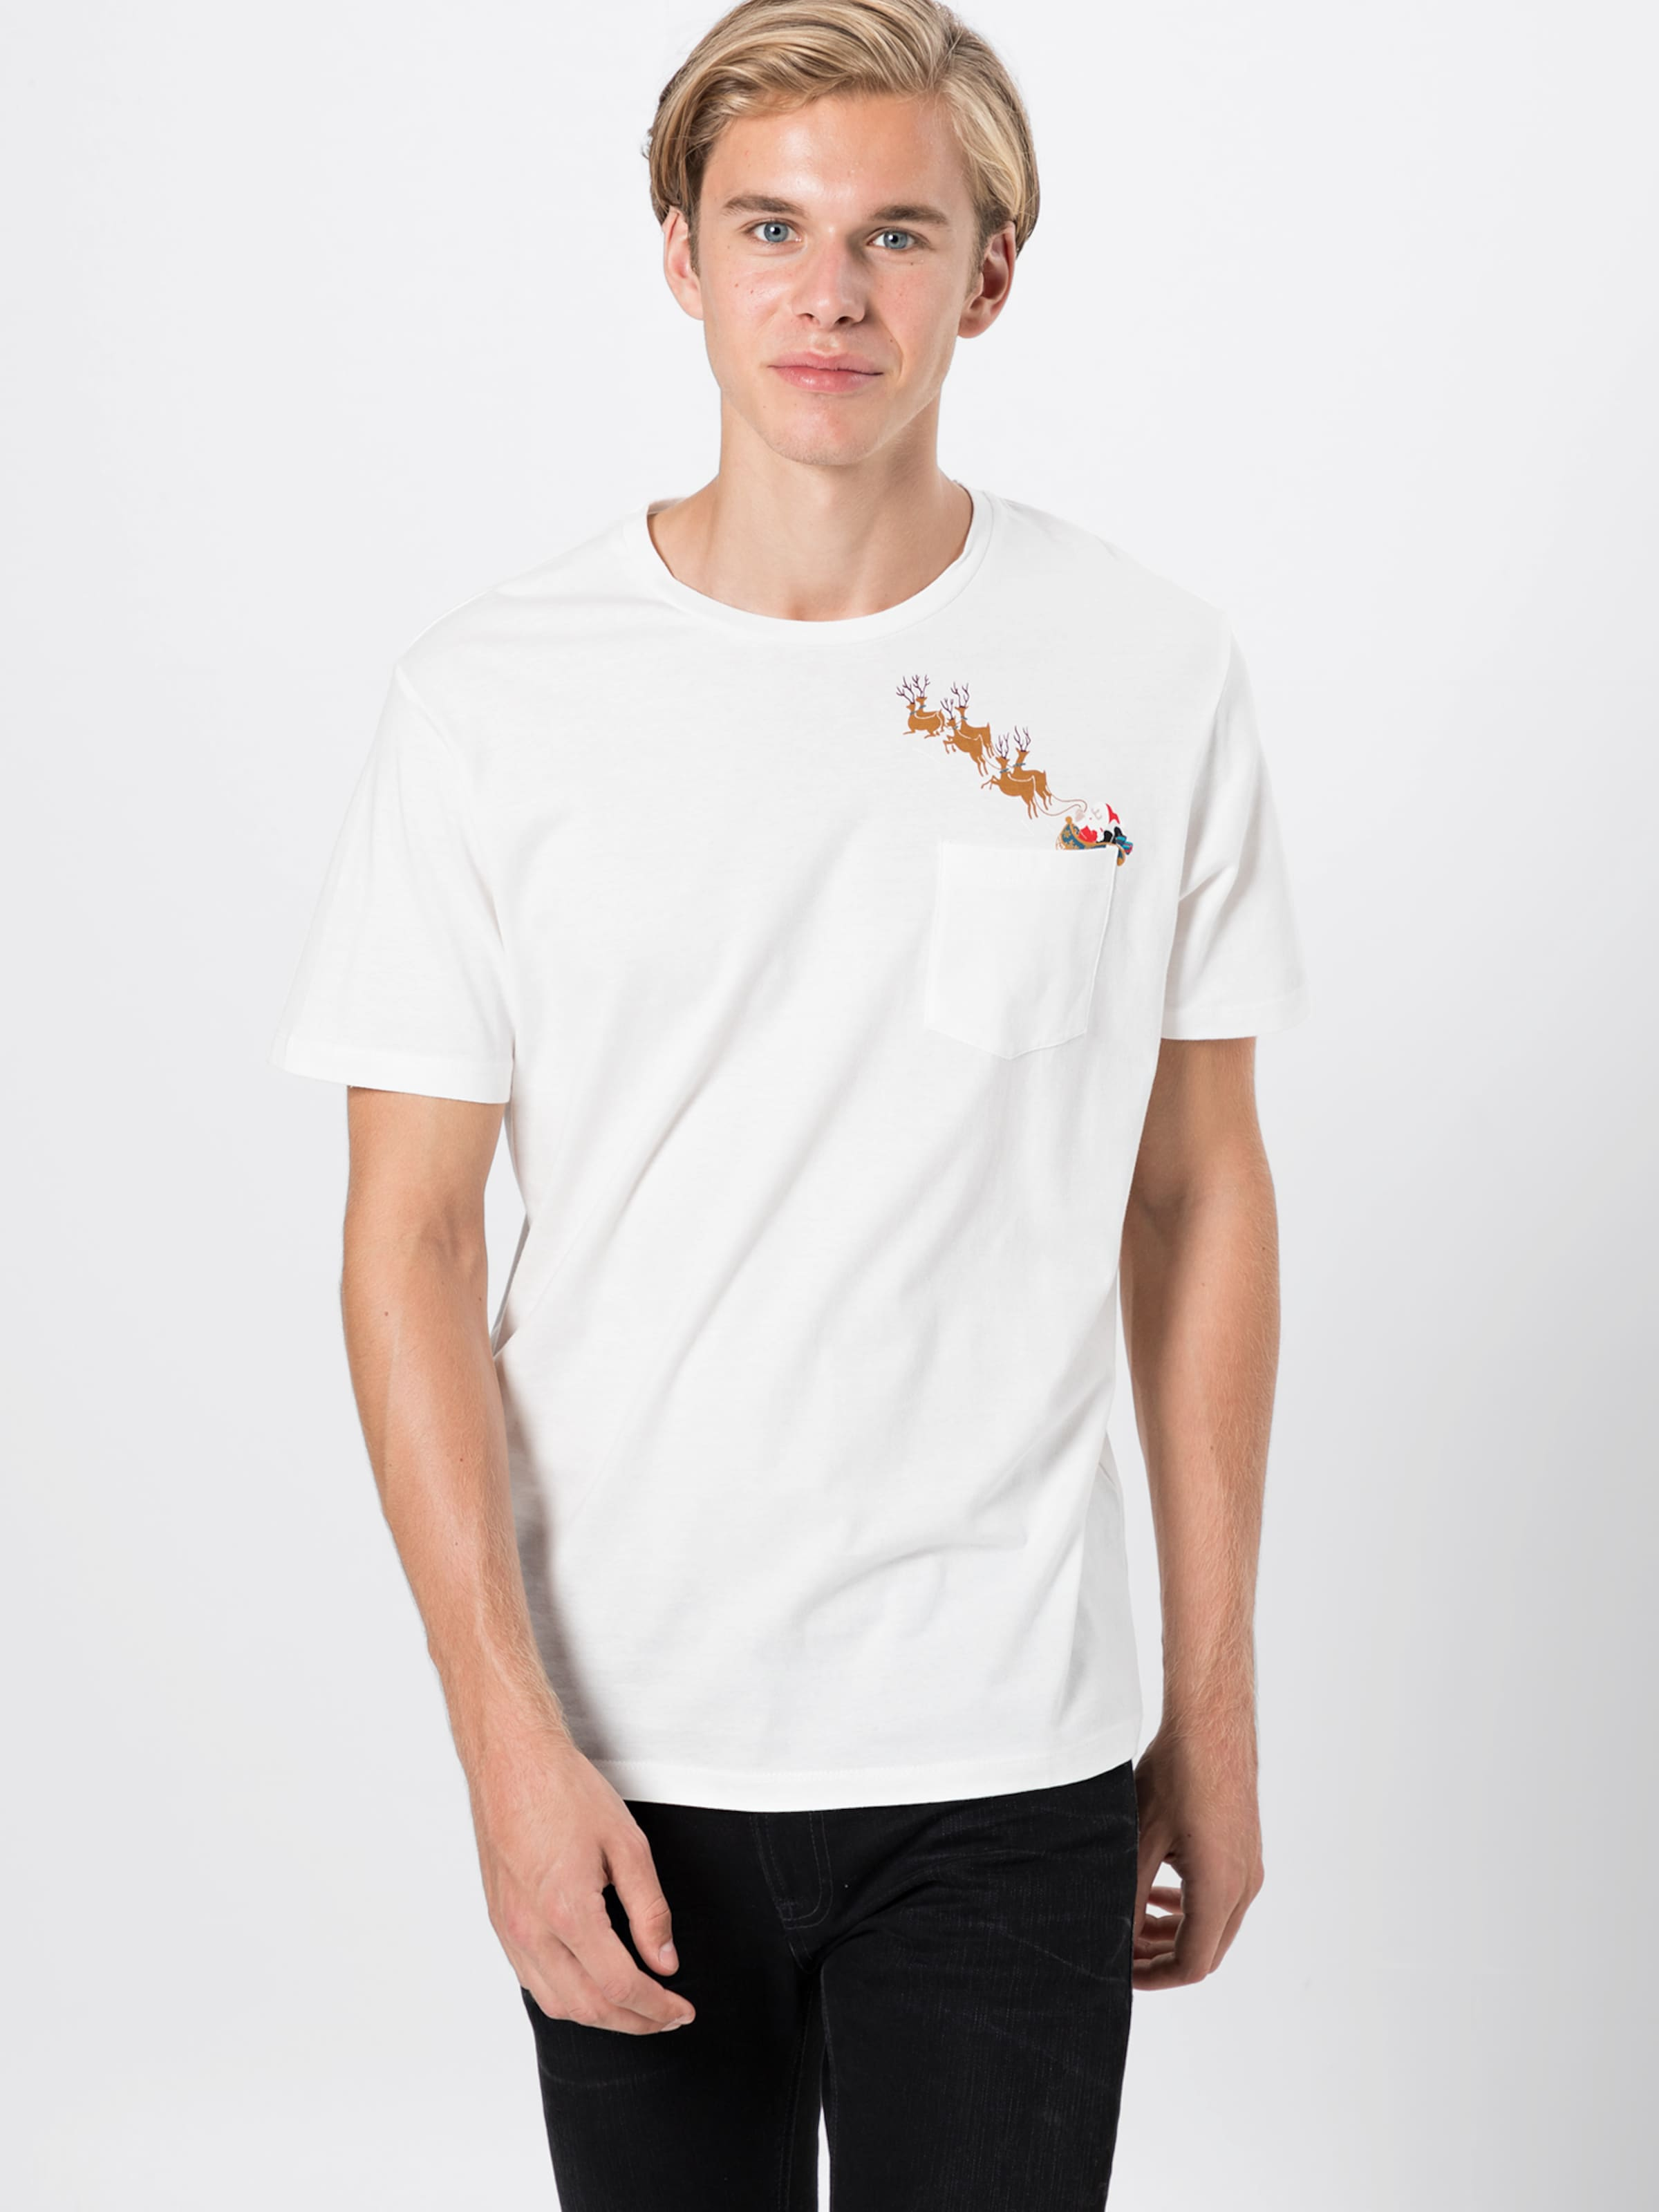 Jones En Blanc shirt T Rouge Jackamp; BleuPétrole CBrdexo